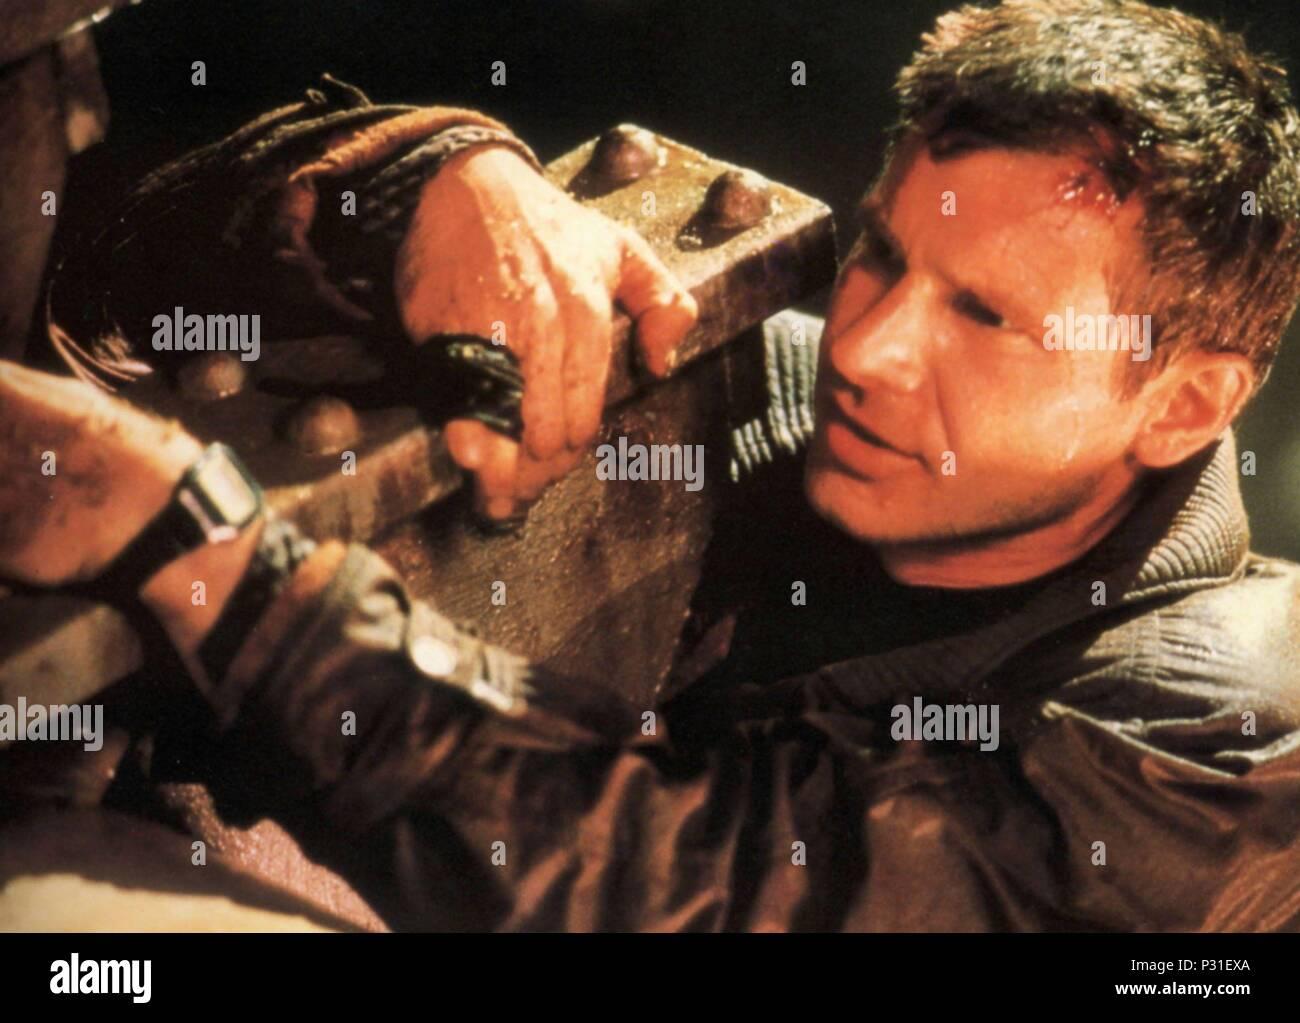 Original Film Title: BLADE RUNNER.  English Title: BLADE RUNNER.  Film Director: RIDLEY SCOTT.  Year: 1982.  Stars: HARRISON FORD. Credit: LADD COMPANY/WARNER BROS / Album - Stock Image